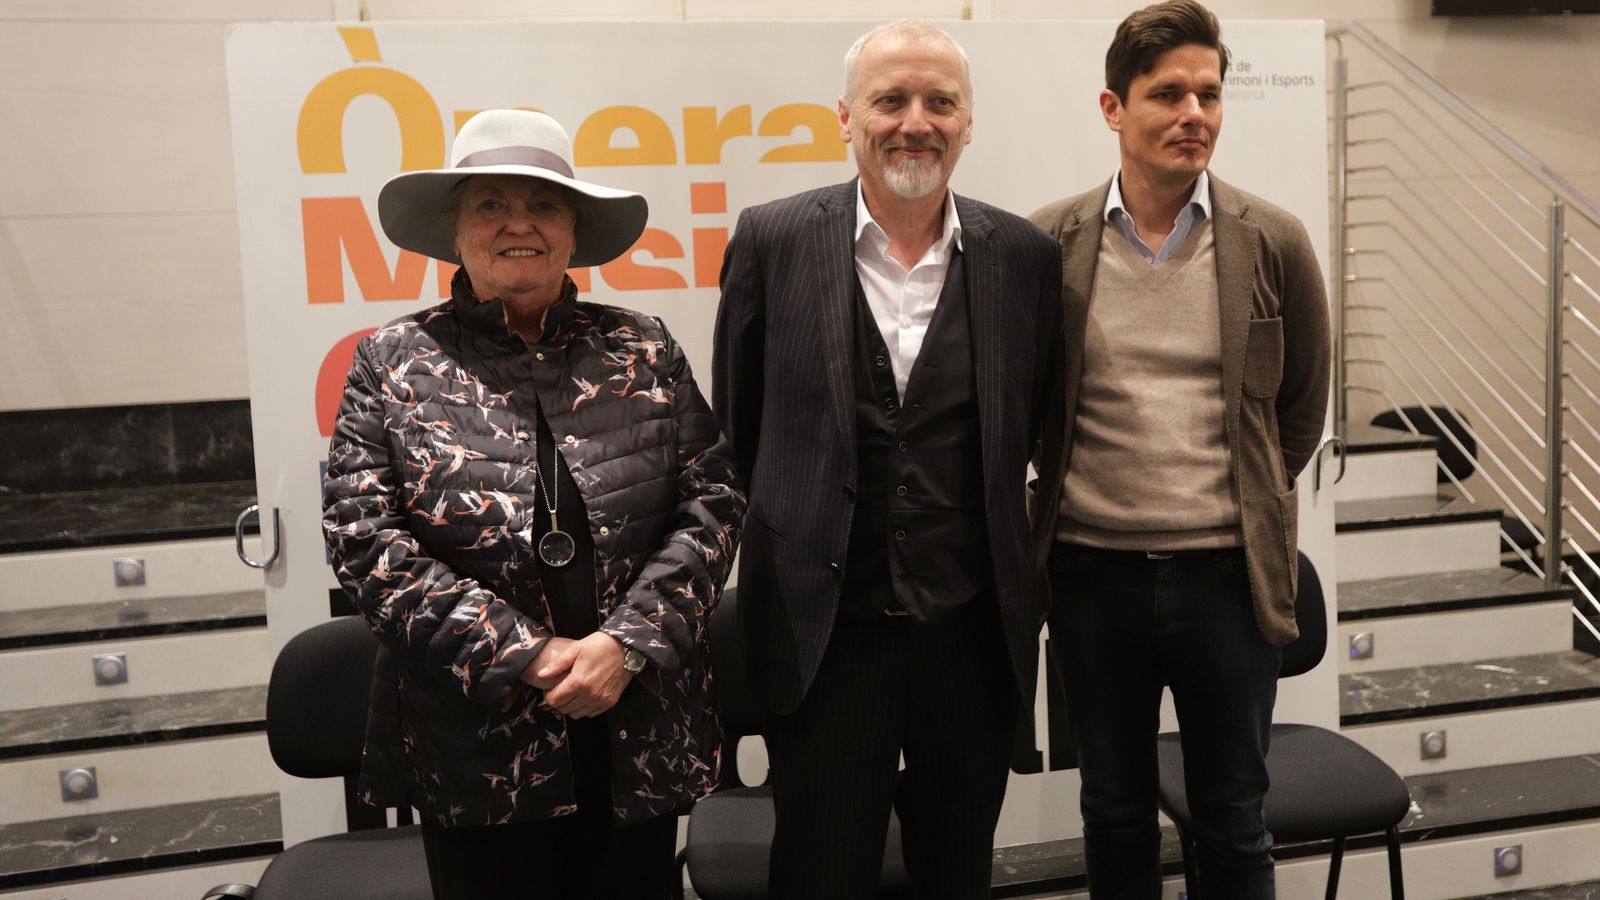 Carlos Forteza junt a Jan Lauwers i Viviane de Muynck